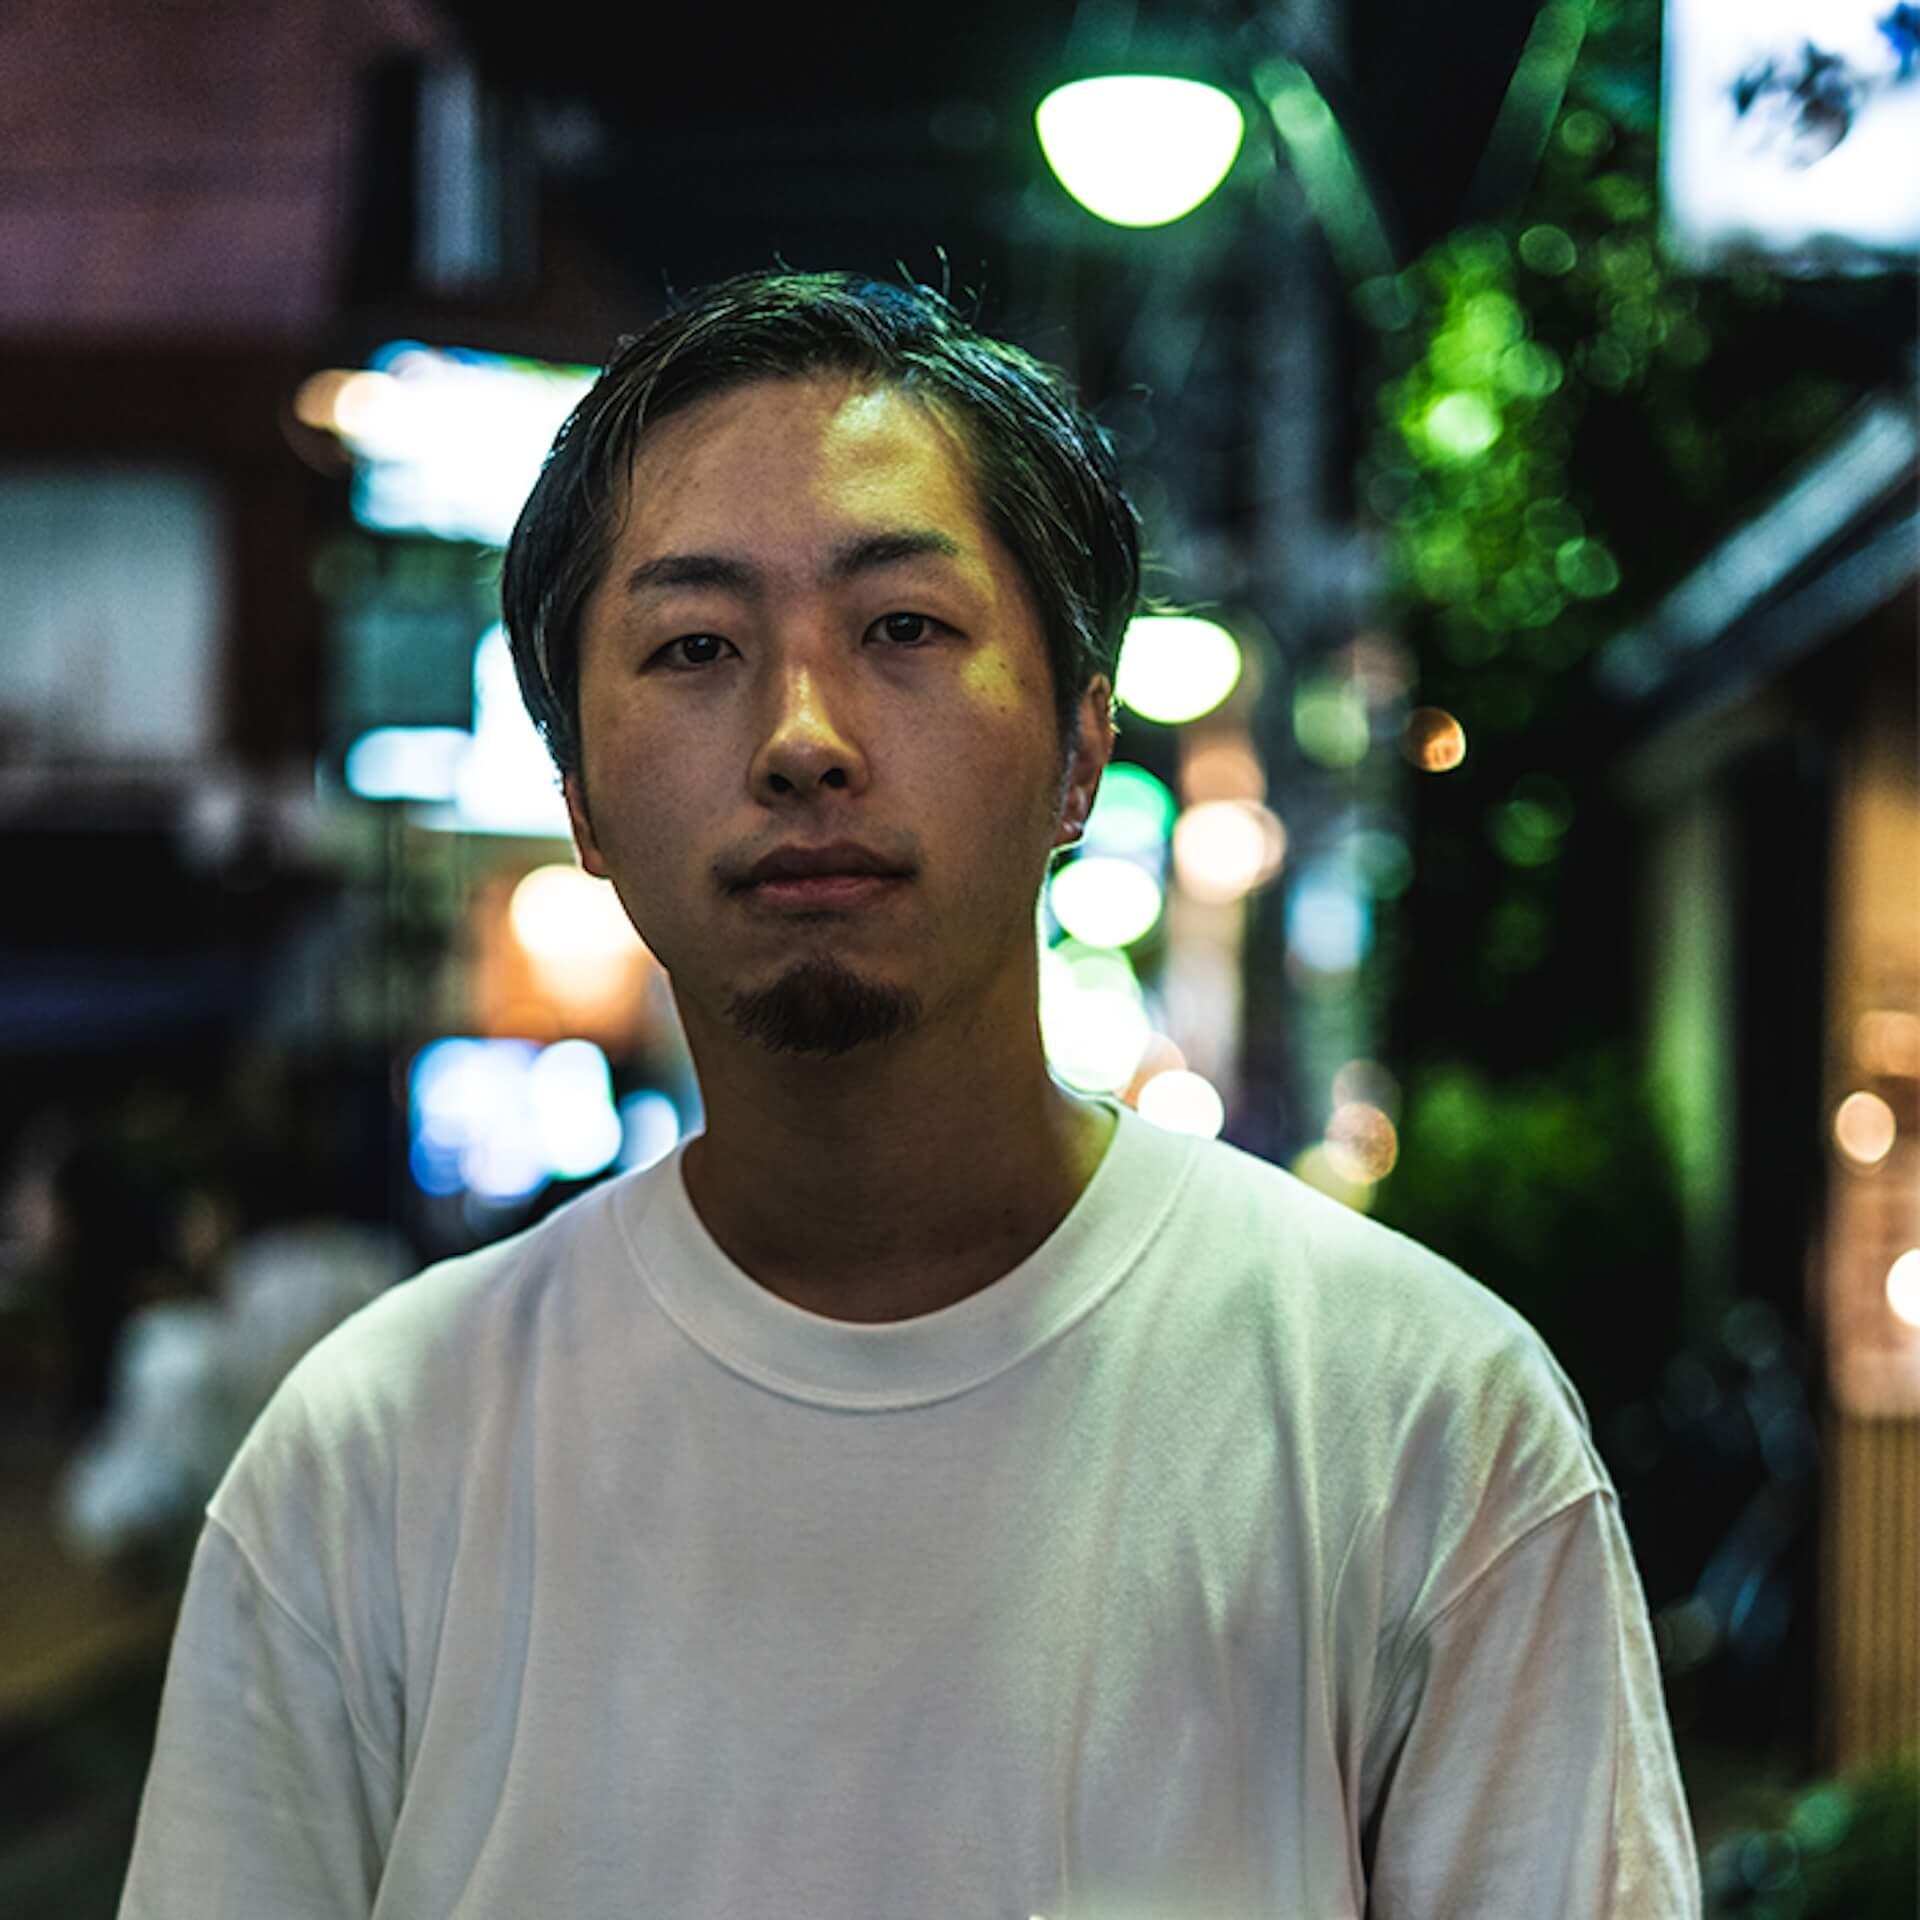 VIDEOTAPEMUSICと天野大地によるドキュメンタリーシリーズ『Our Music: Tatebayashi』がLINE NEWSにて配信開始!「試行錯誤の末に音楽を作った2020年春の記録」 music200515_ourmusic_3